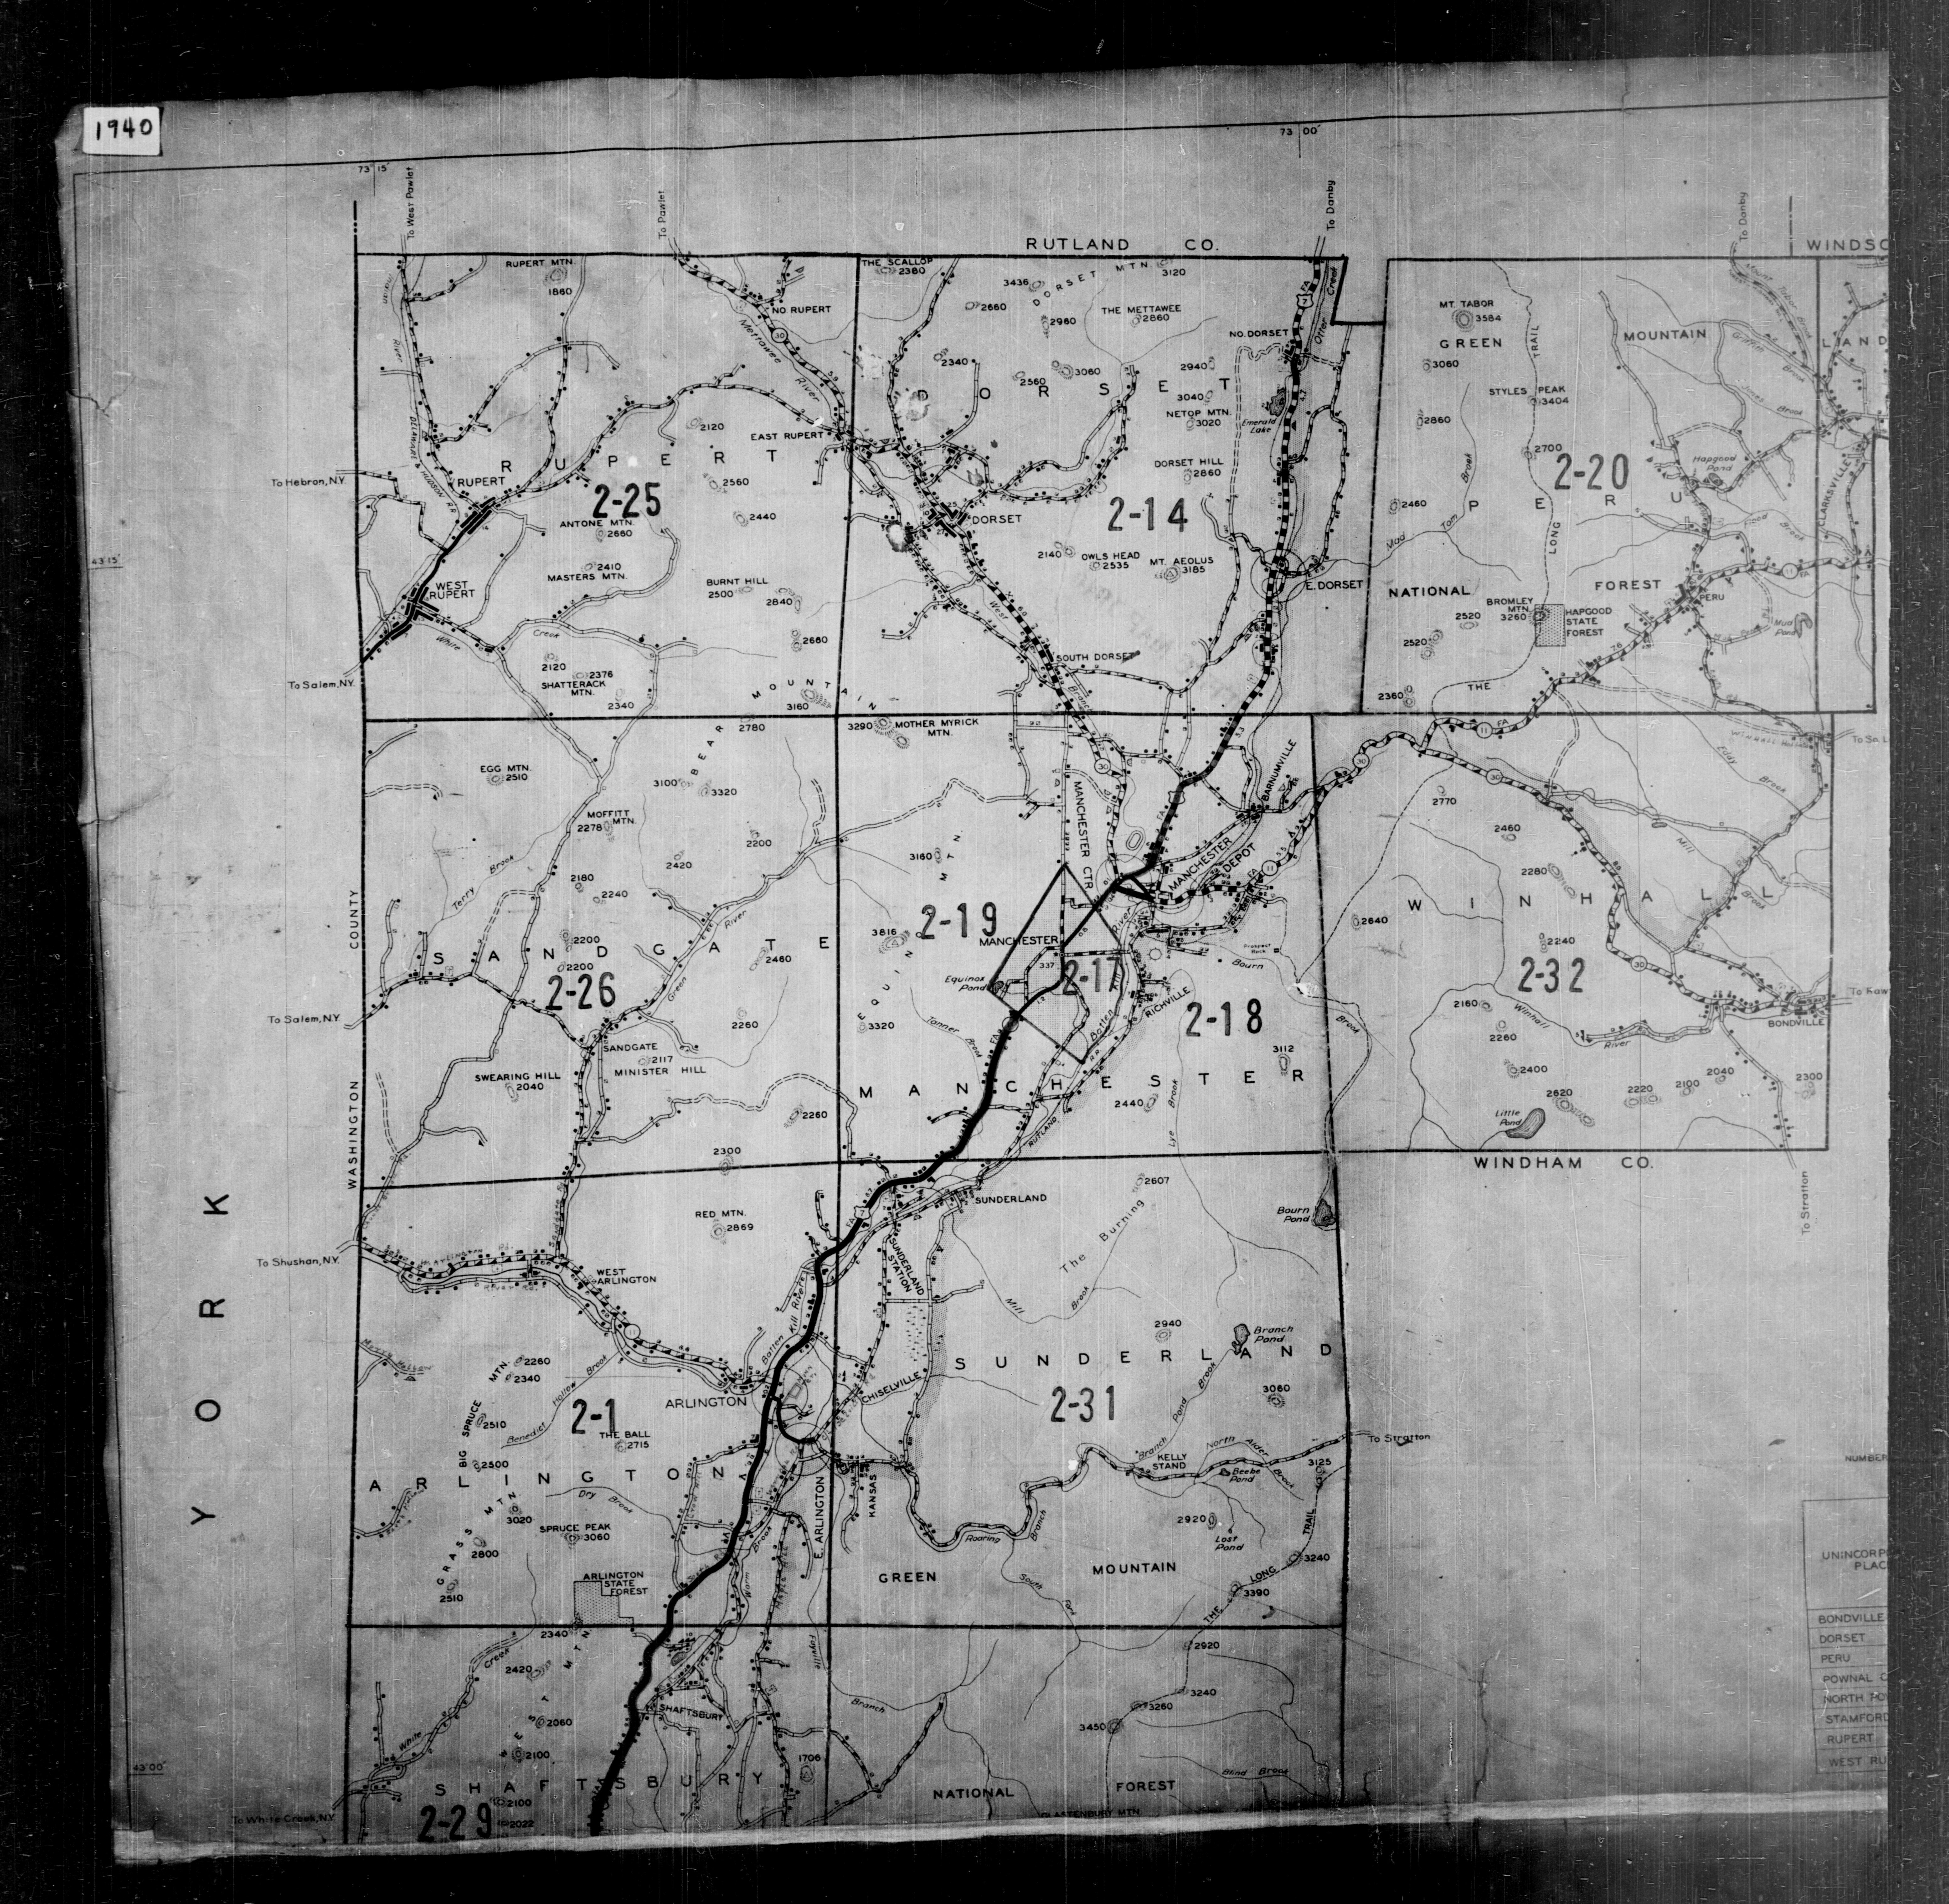 1940 Census Enumeration District Maps - Vermont - Bennington County - ED 2-1 - ED 2-33